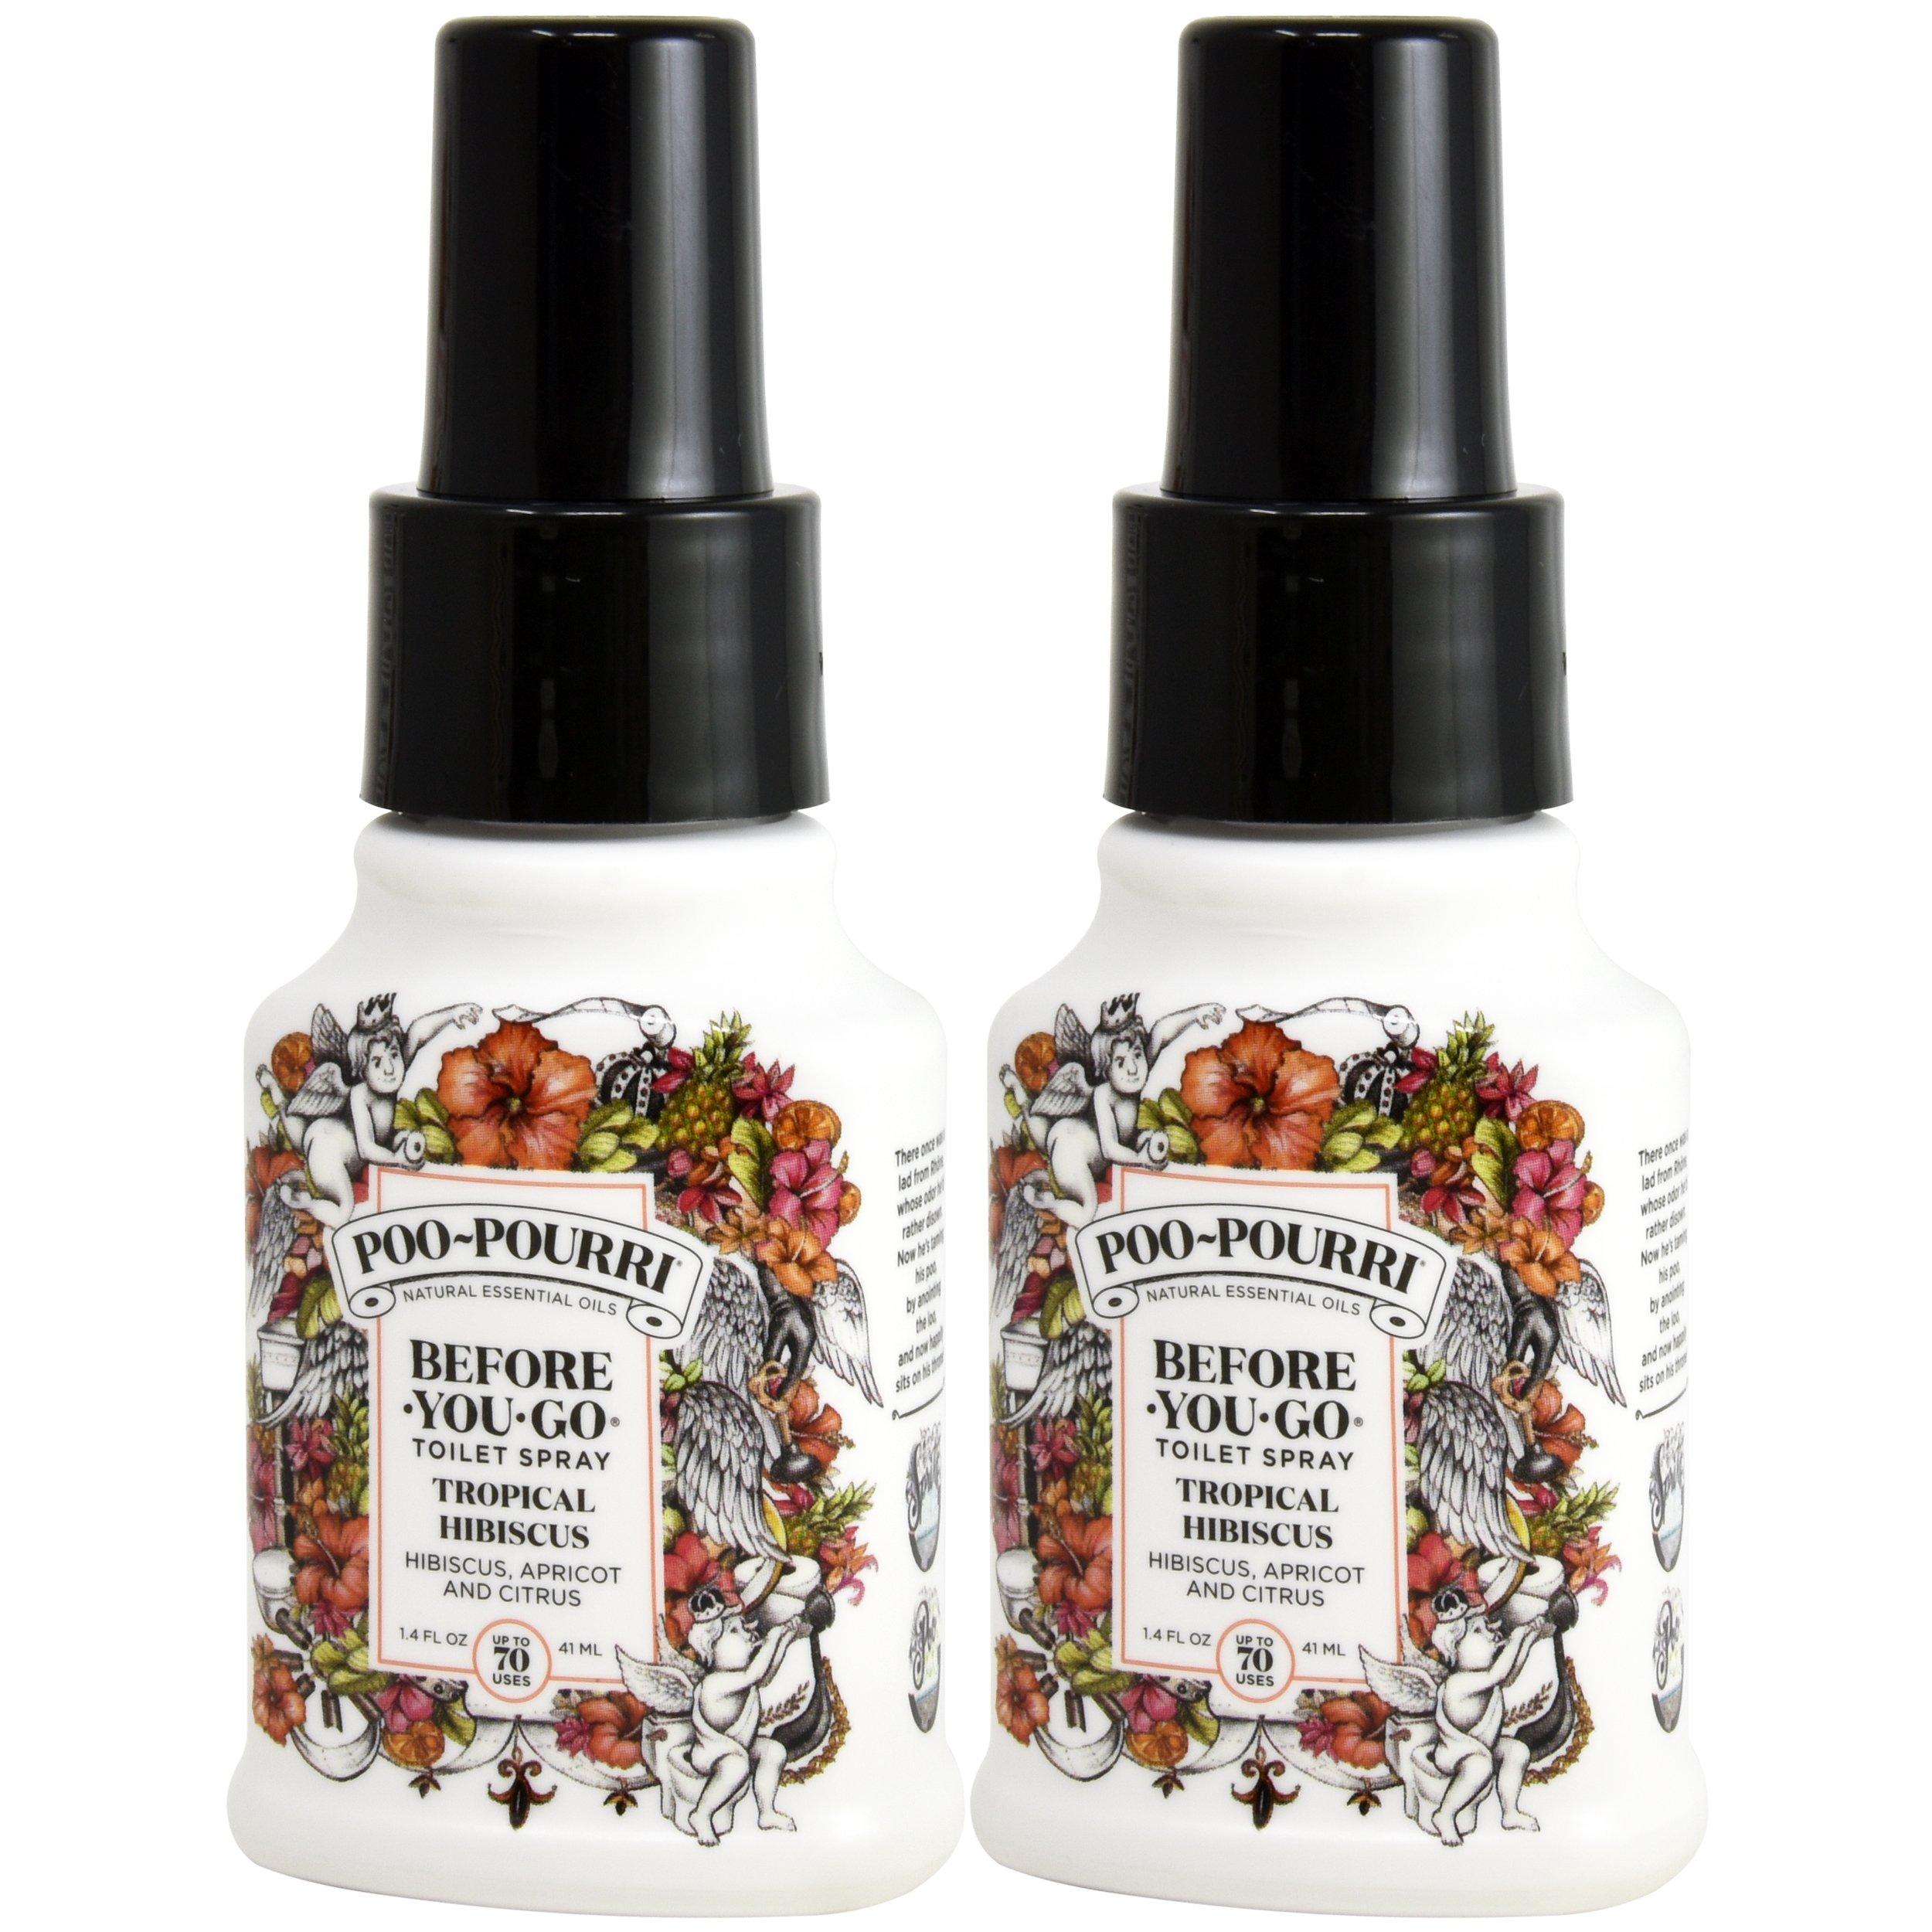 Poo-Pourri, Before-You-Go Bathroom Spray, Tropical Hibiscus - 1.4 oz, 2 Pack